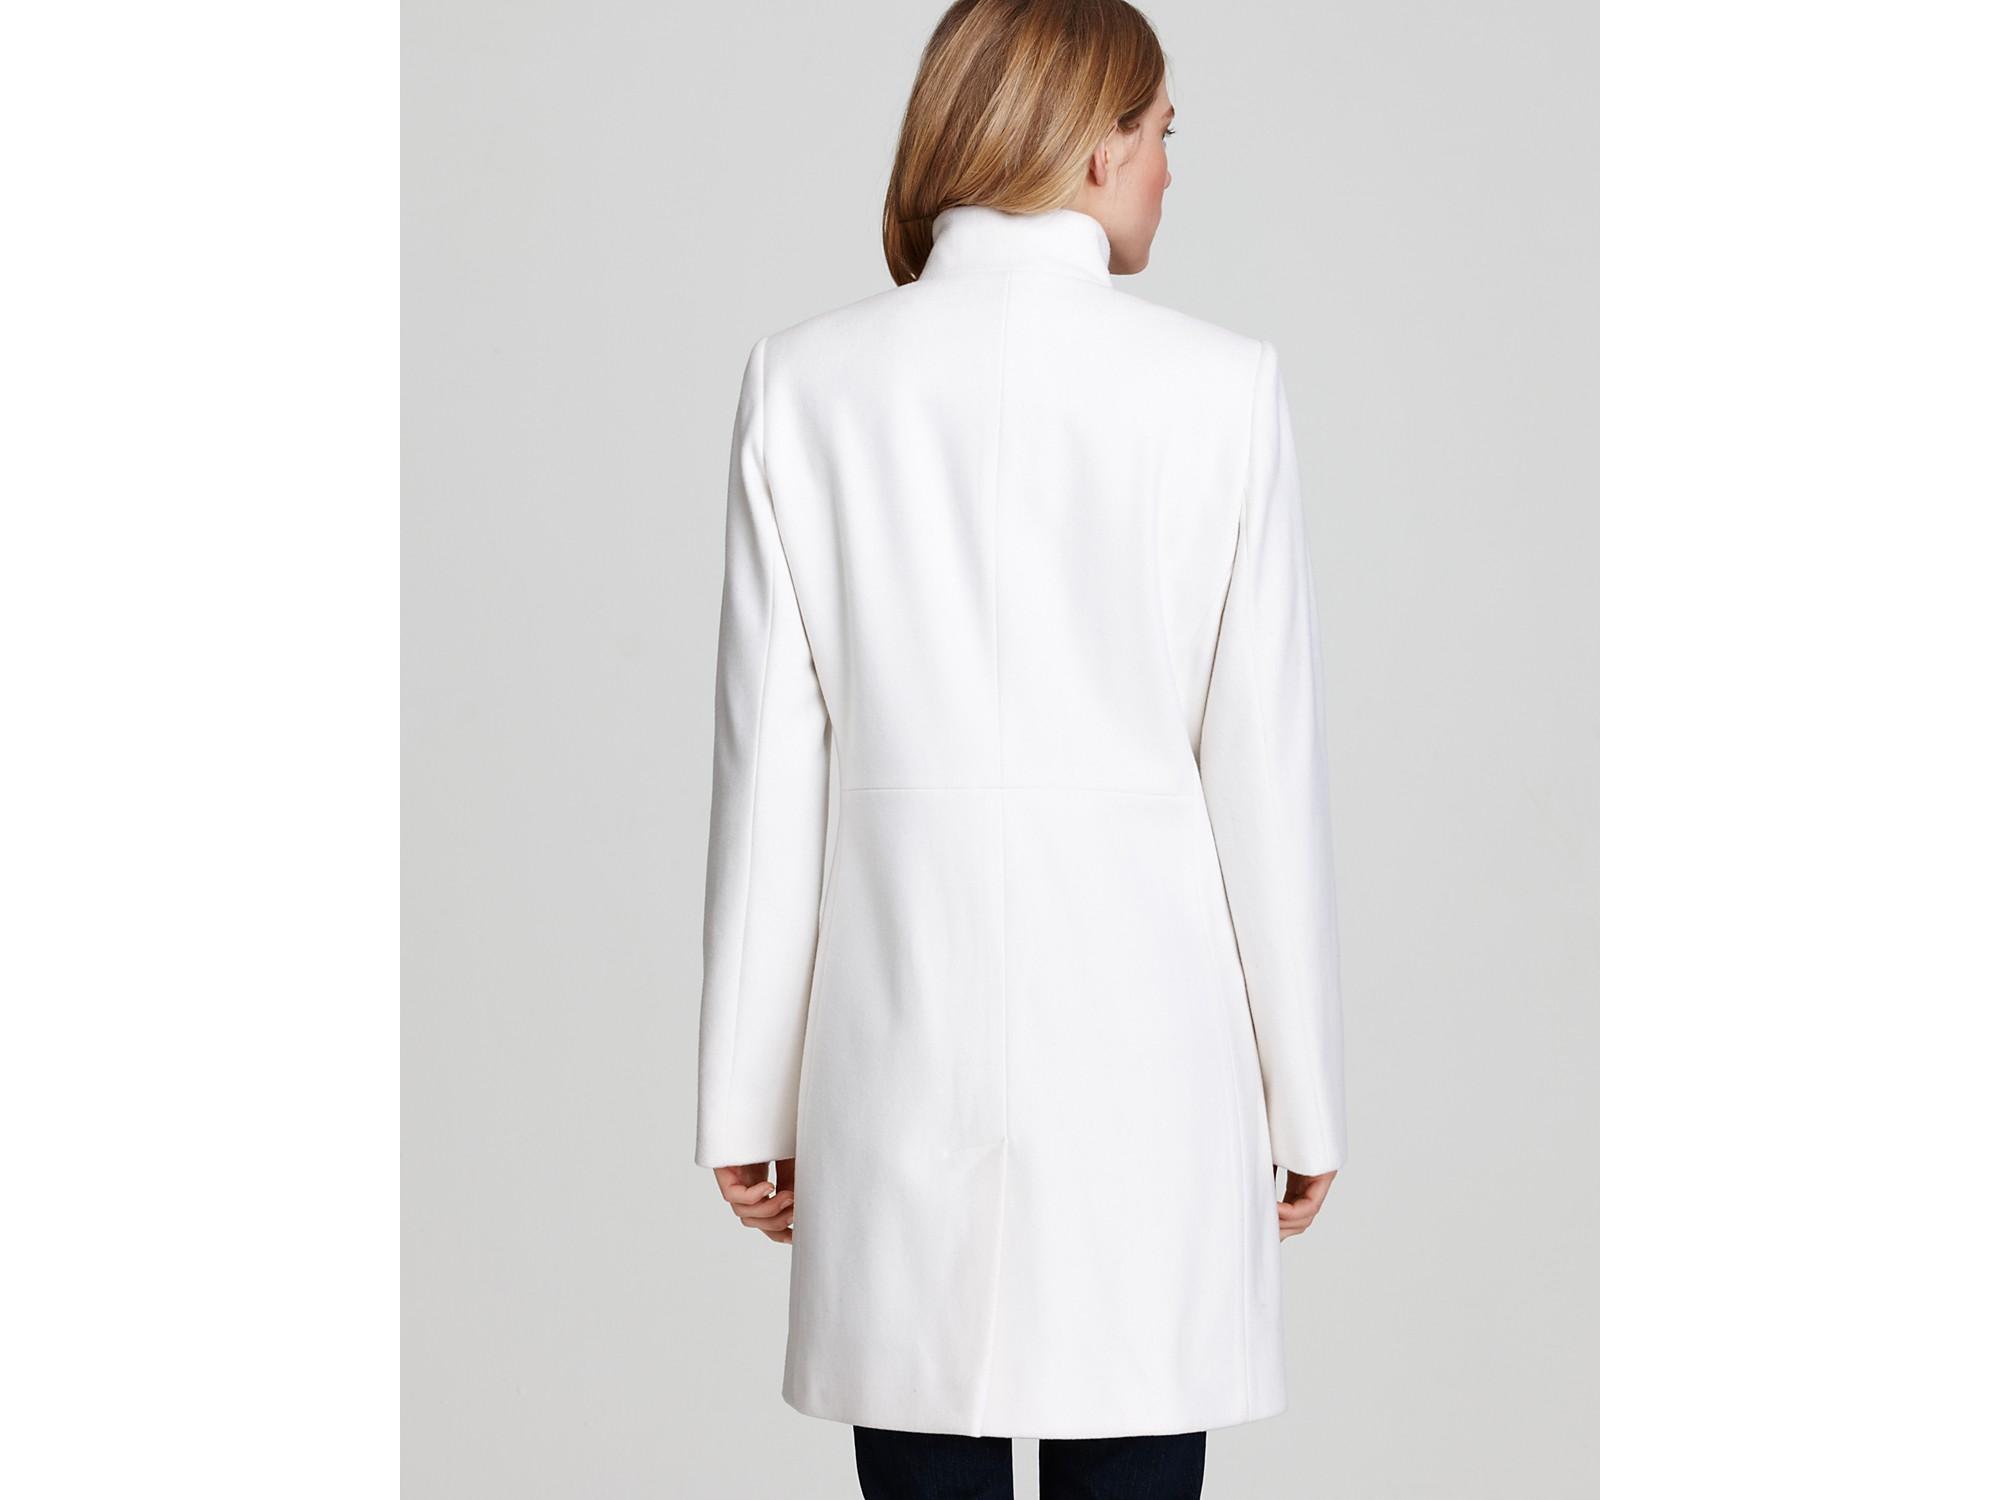 Winter white toggle coat